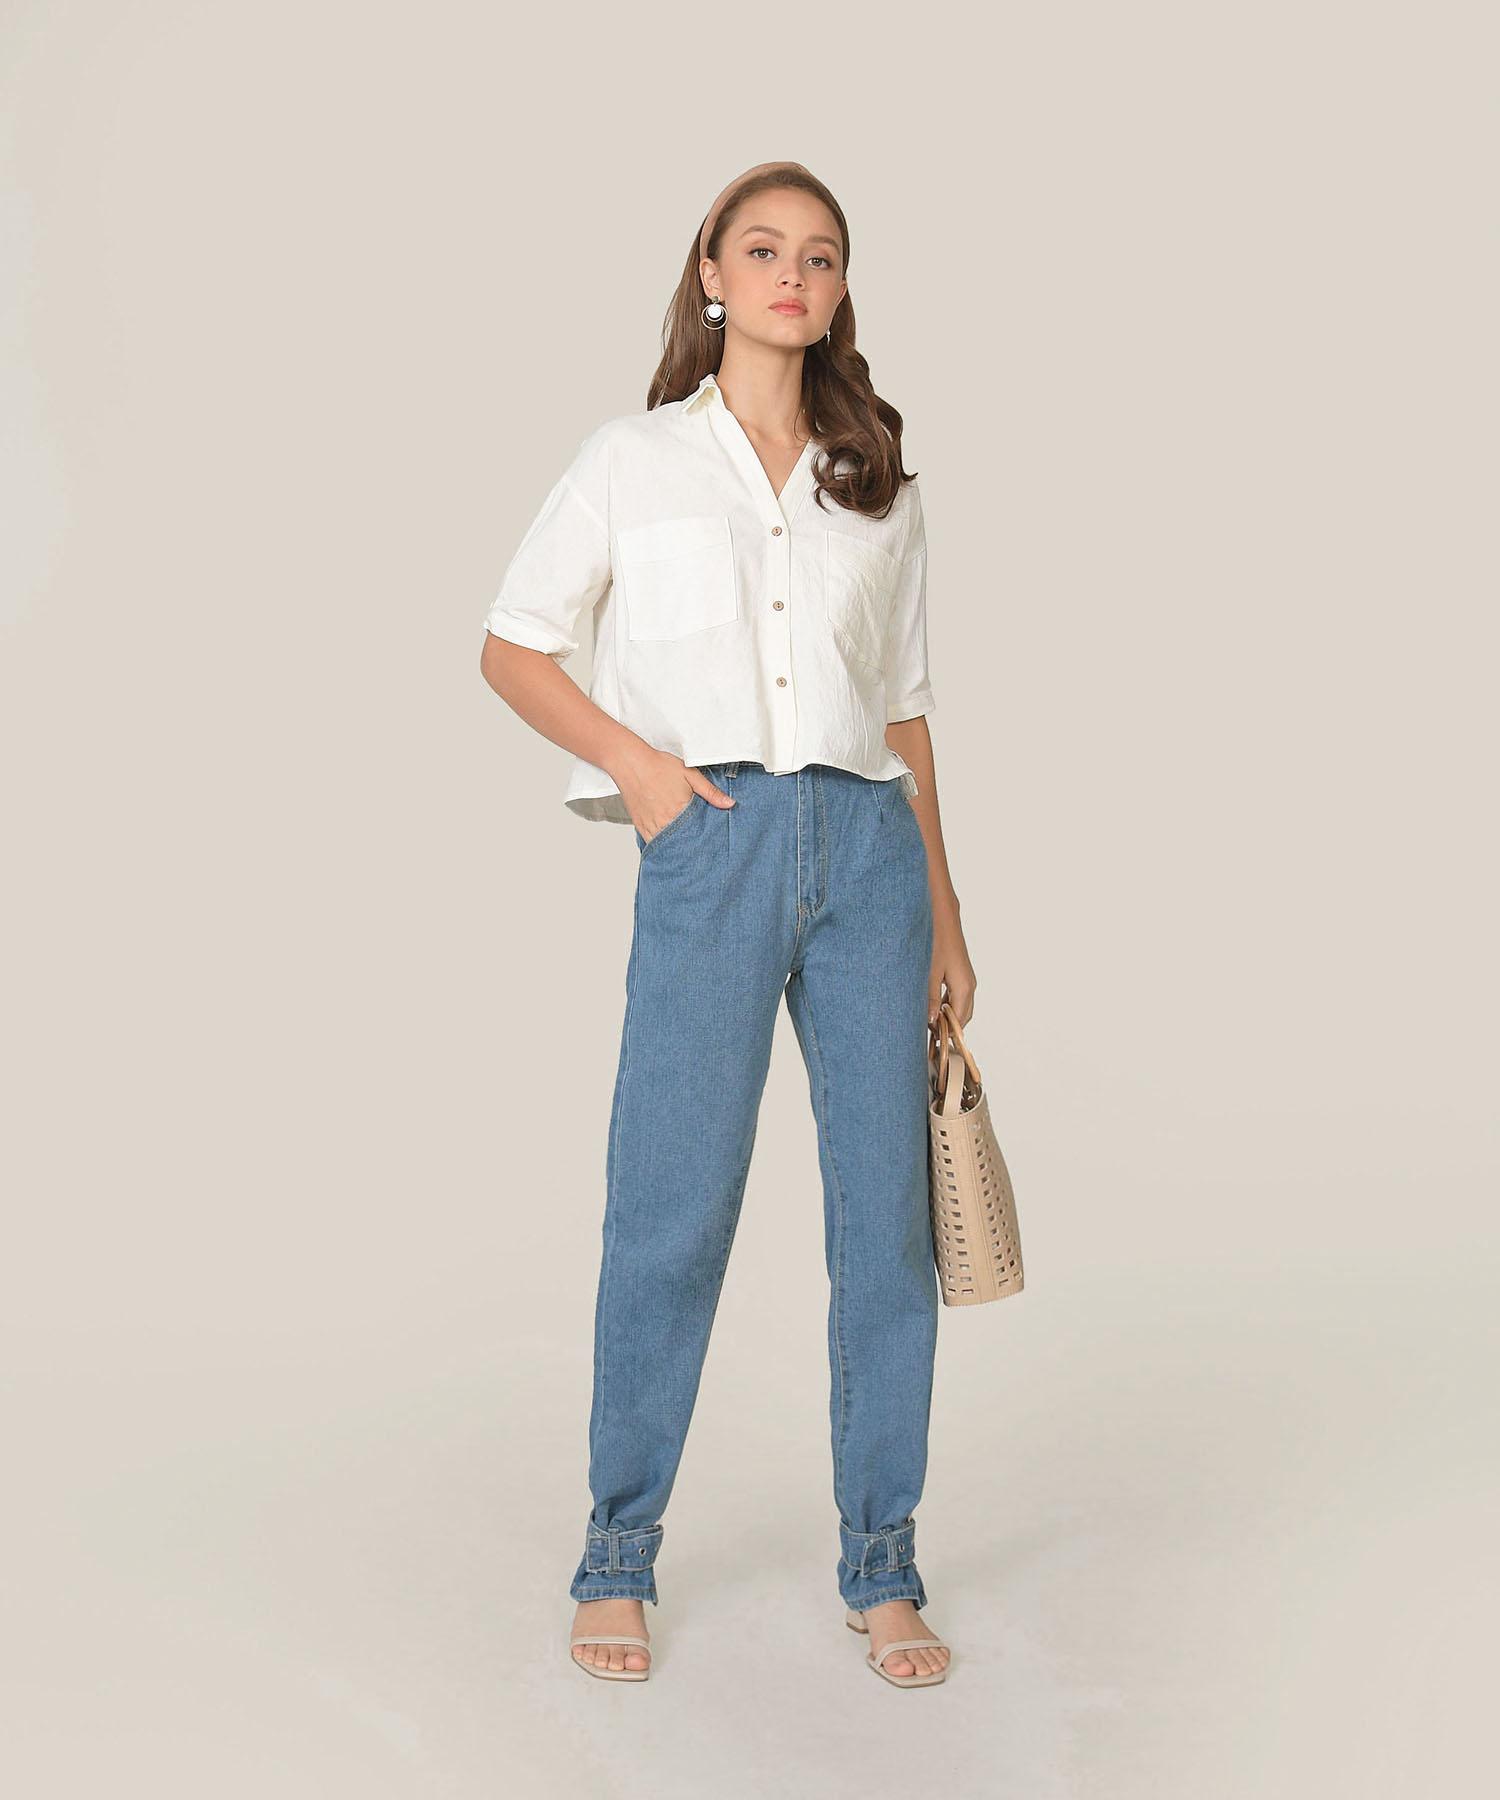 rio-high-waisted-cuffed-ankle-jeans-medium-wash-1